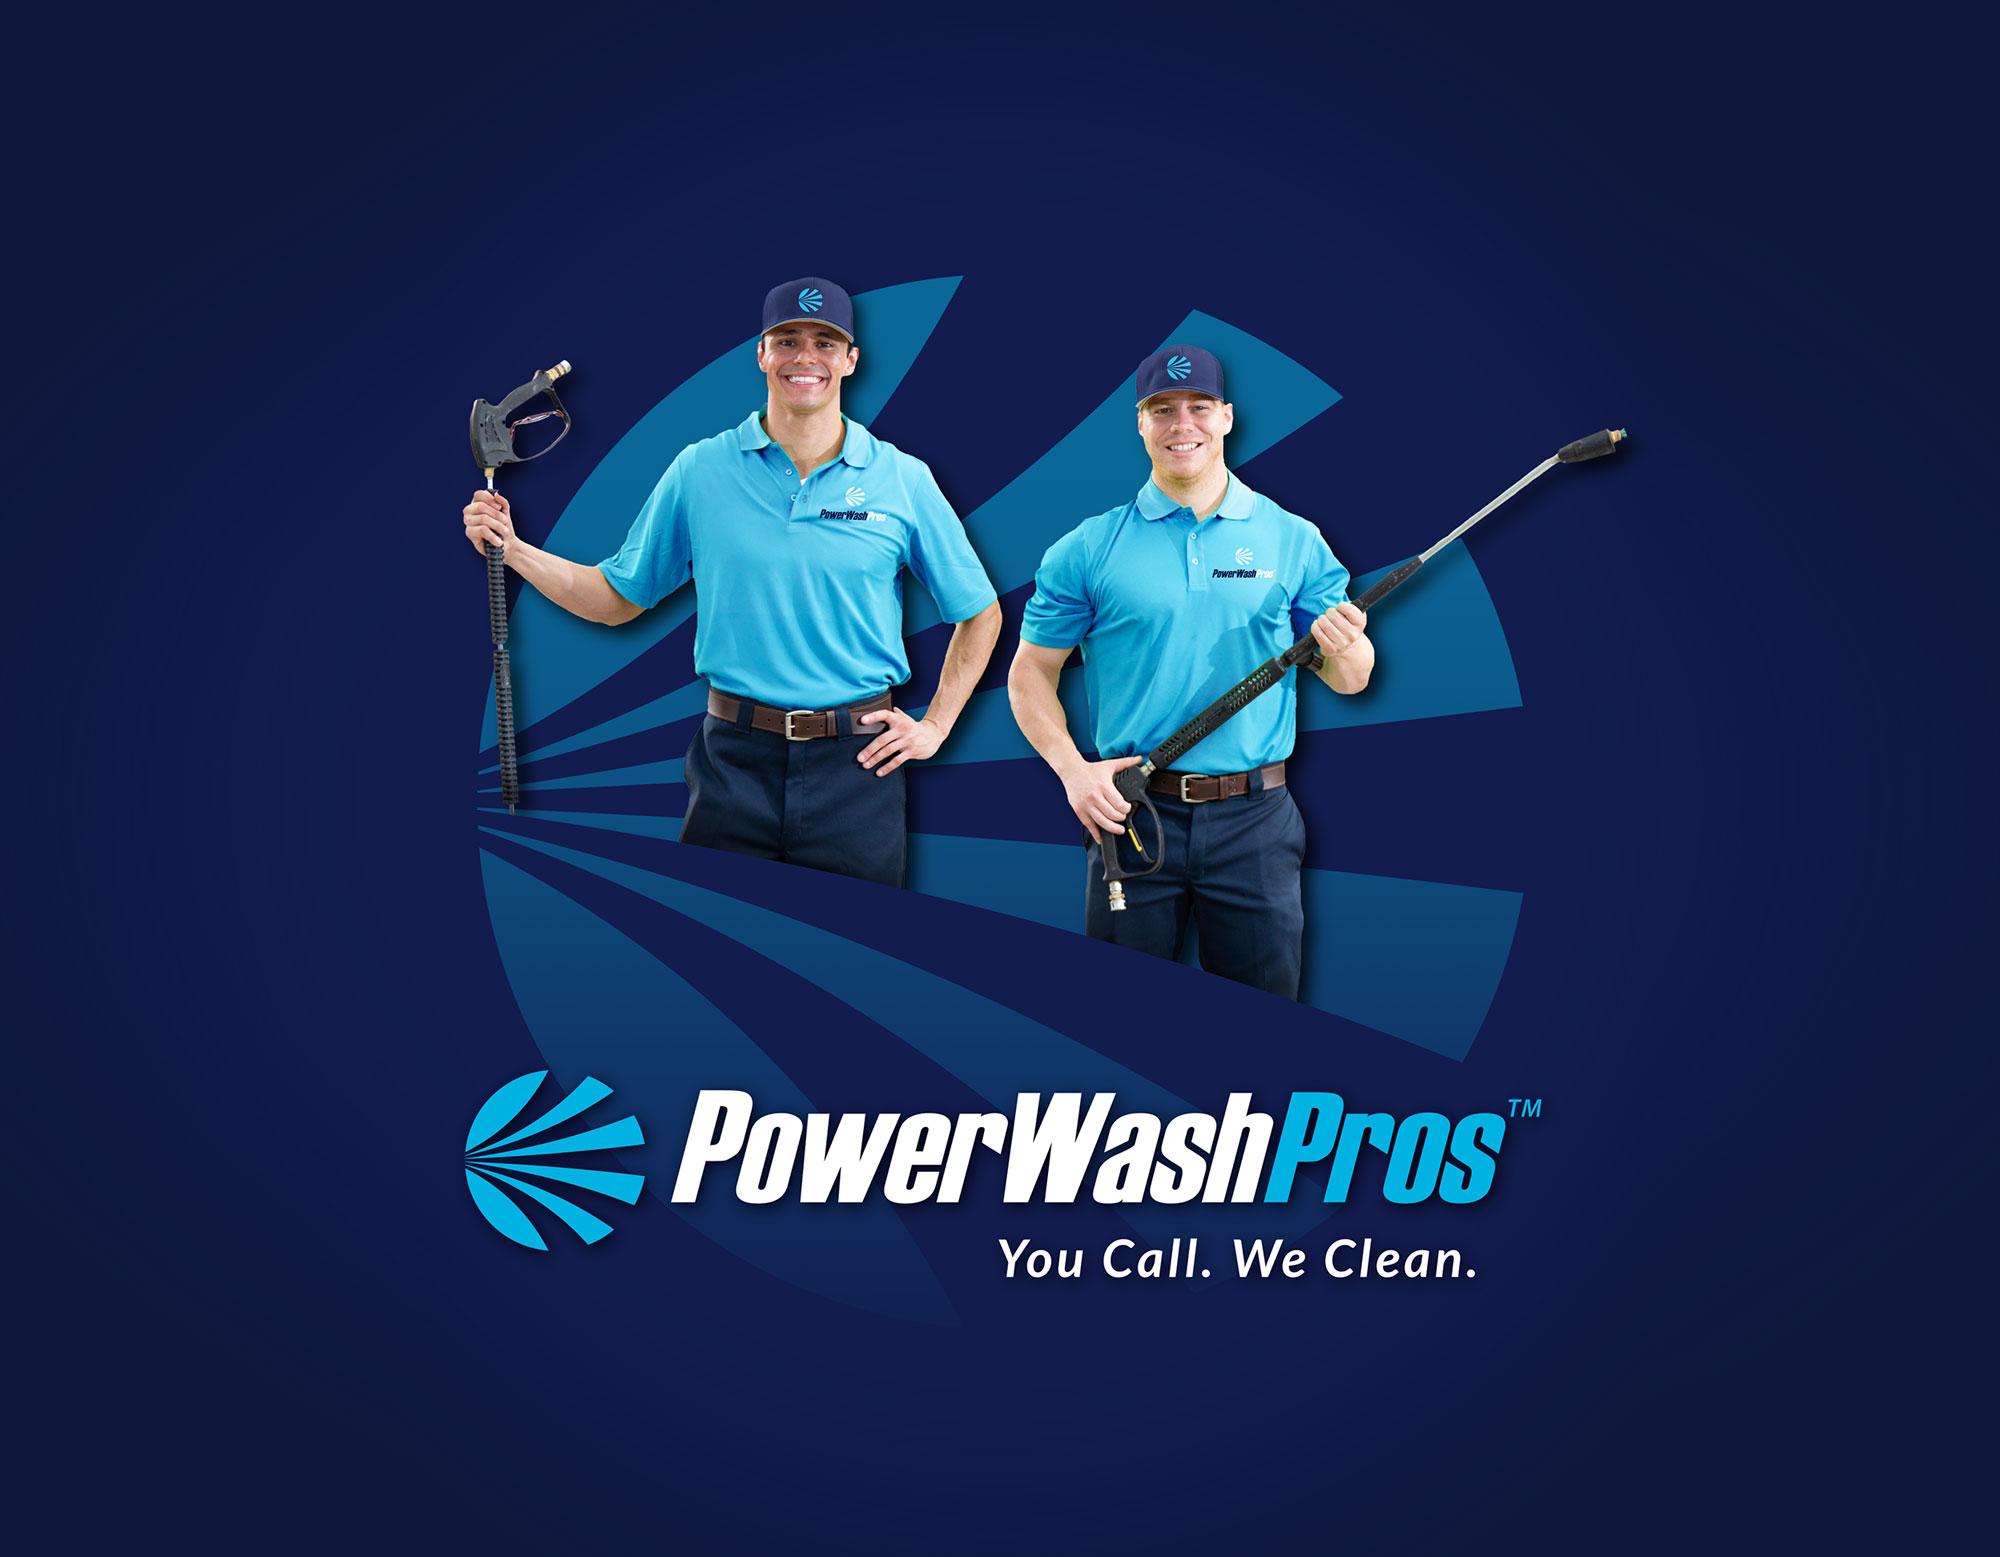 PWP main branding image